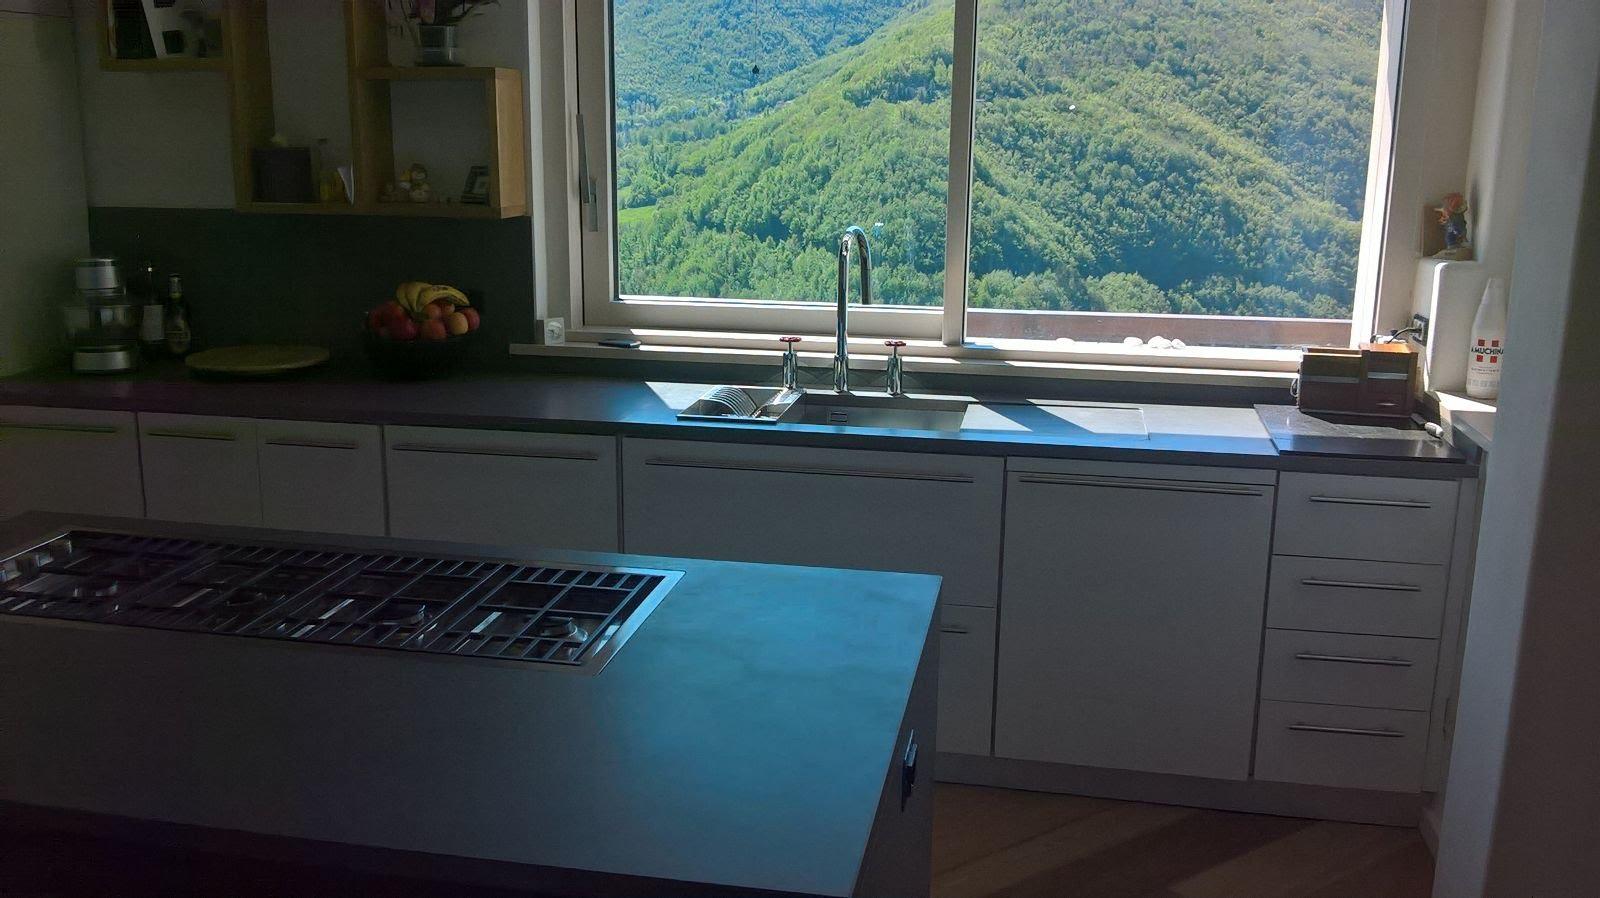 Cucina in rovere sbiancato affordable cucine cucine moderne in